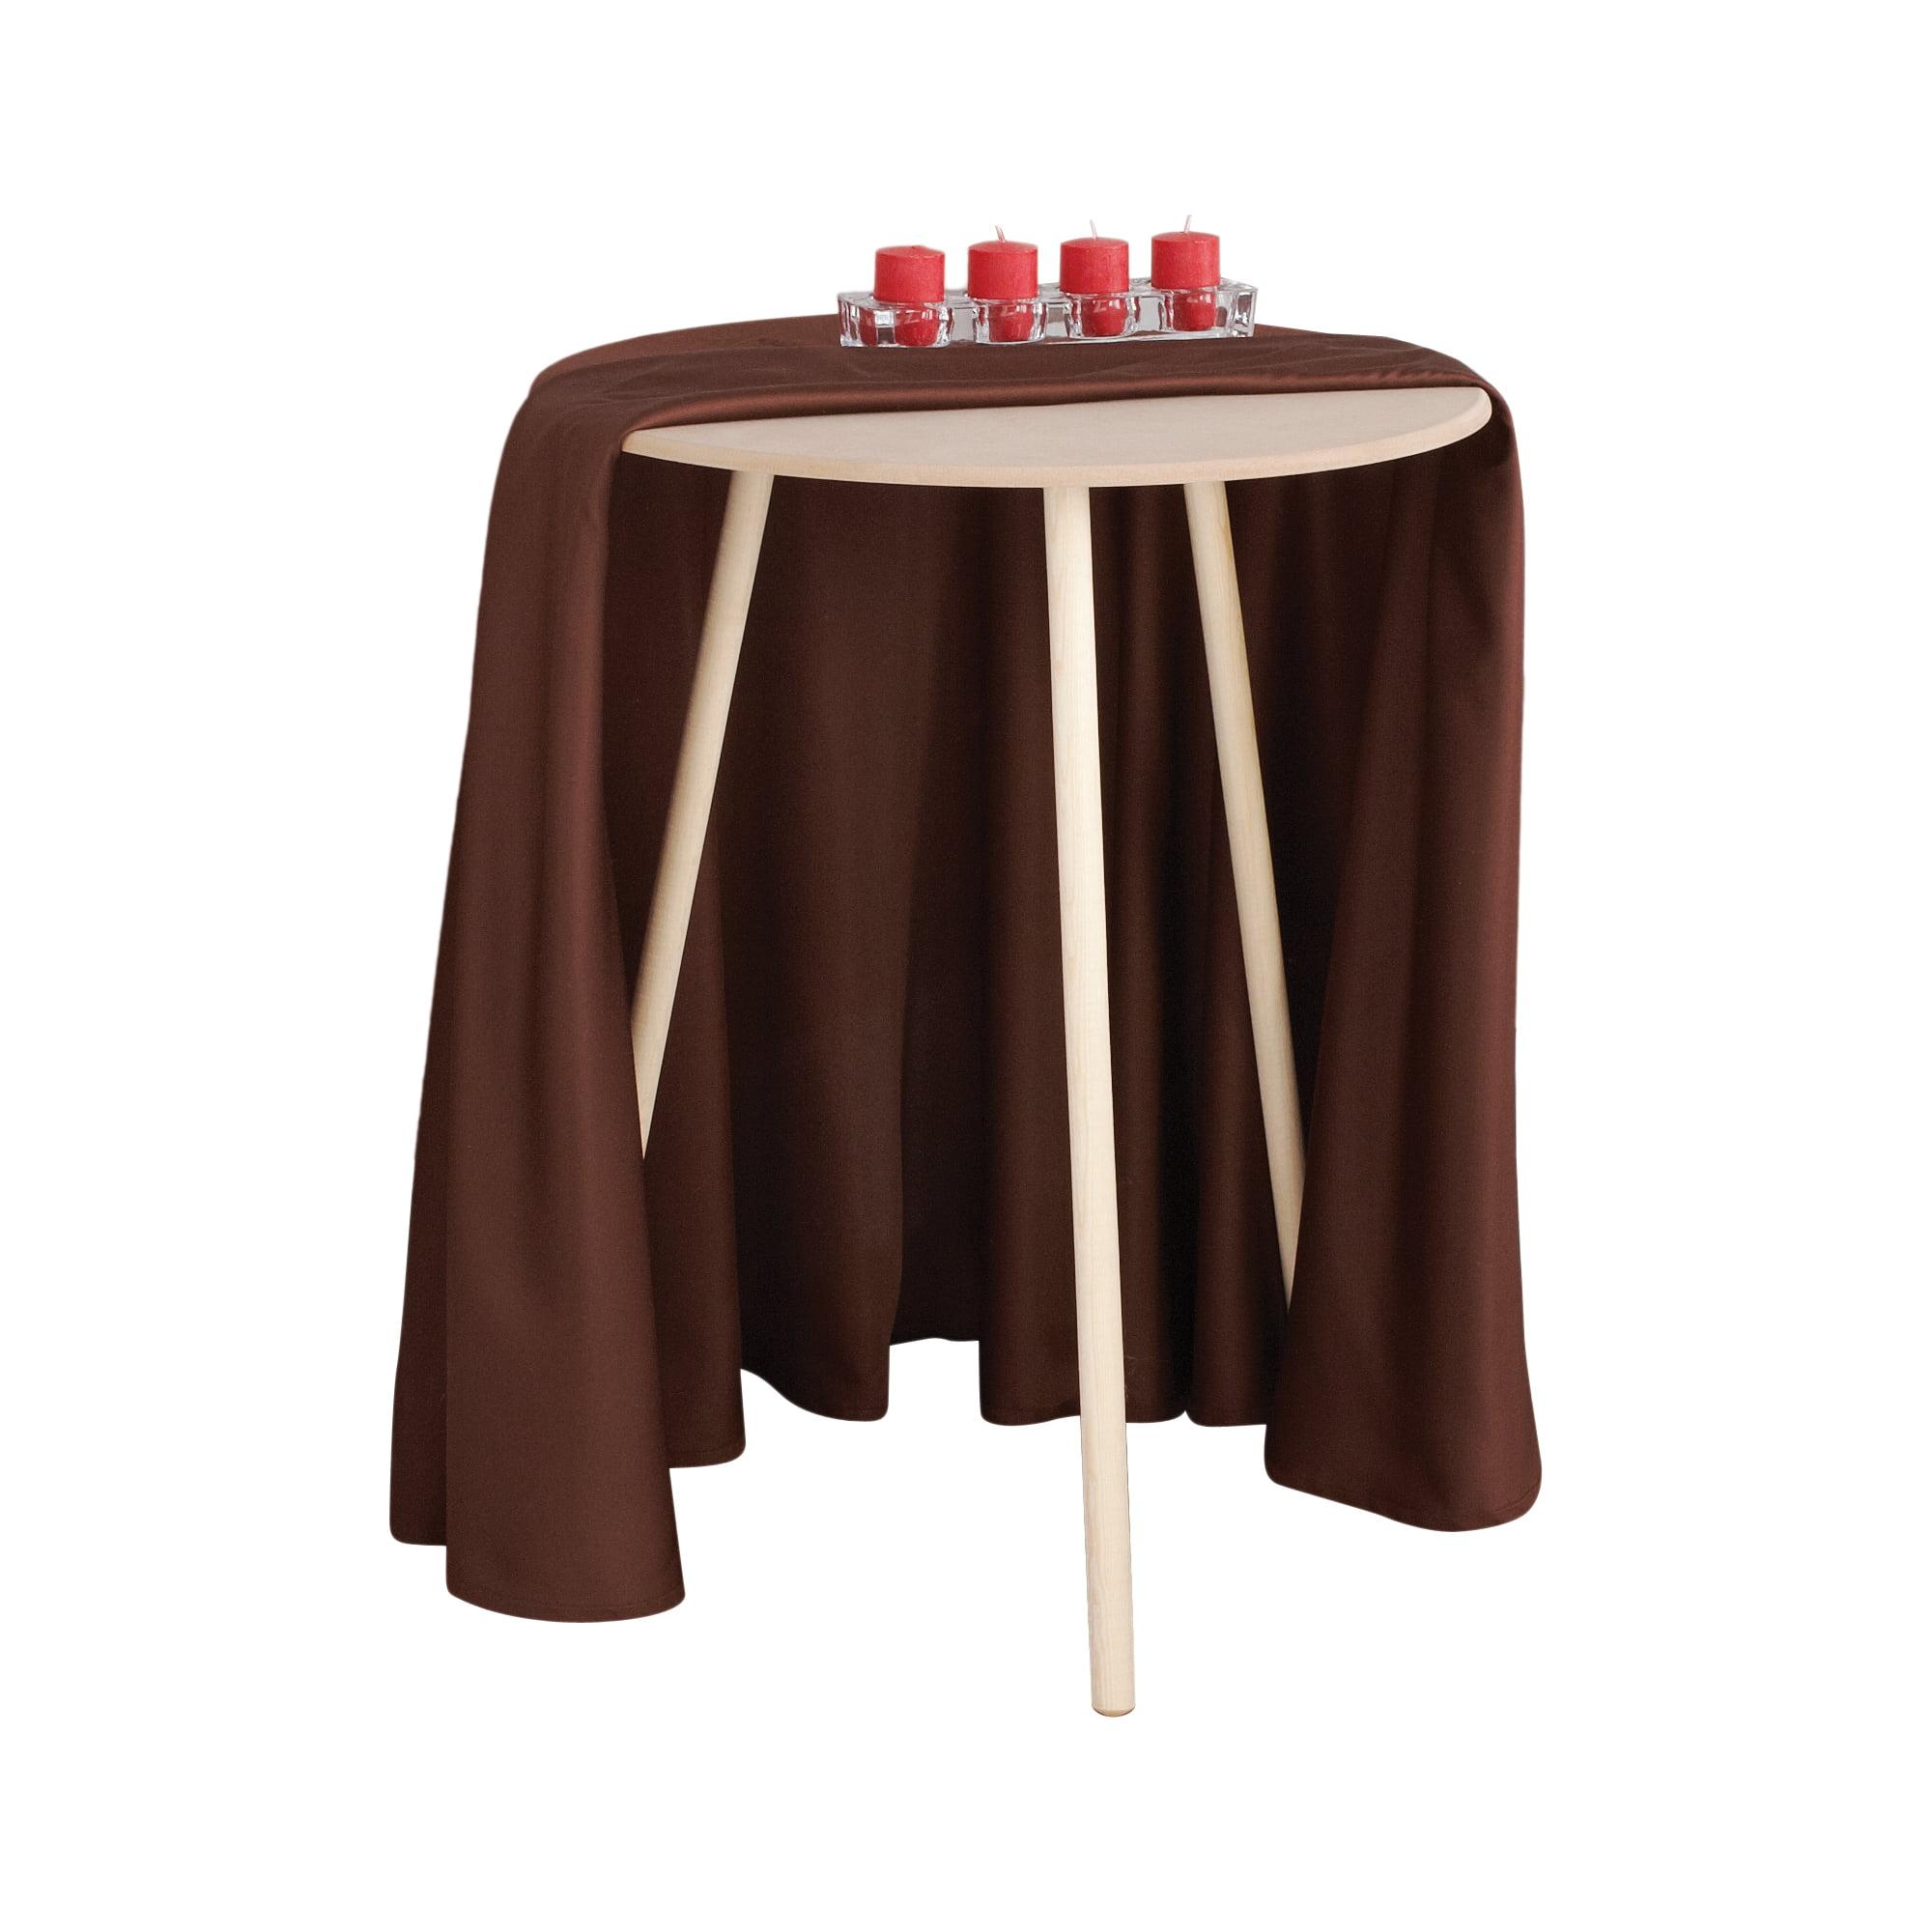 Mainstays 20 Round Decorative Table